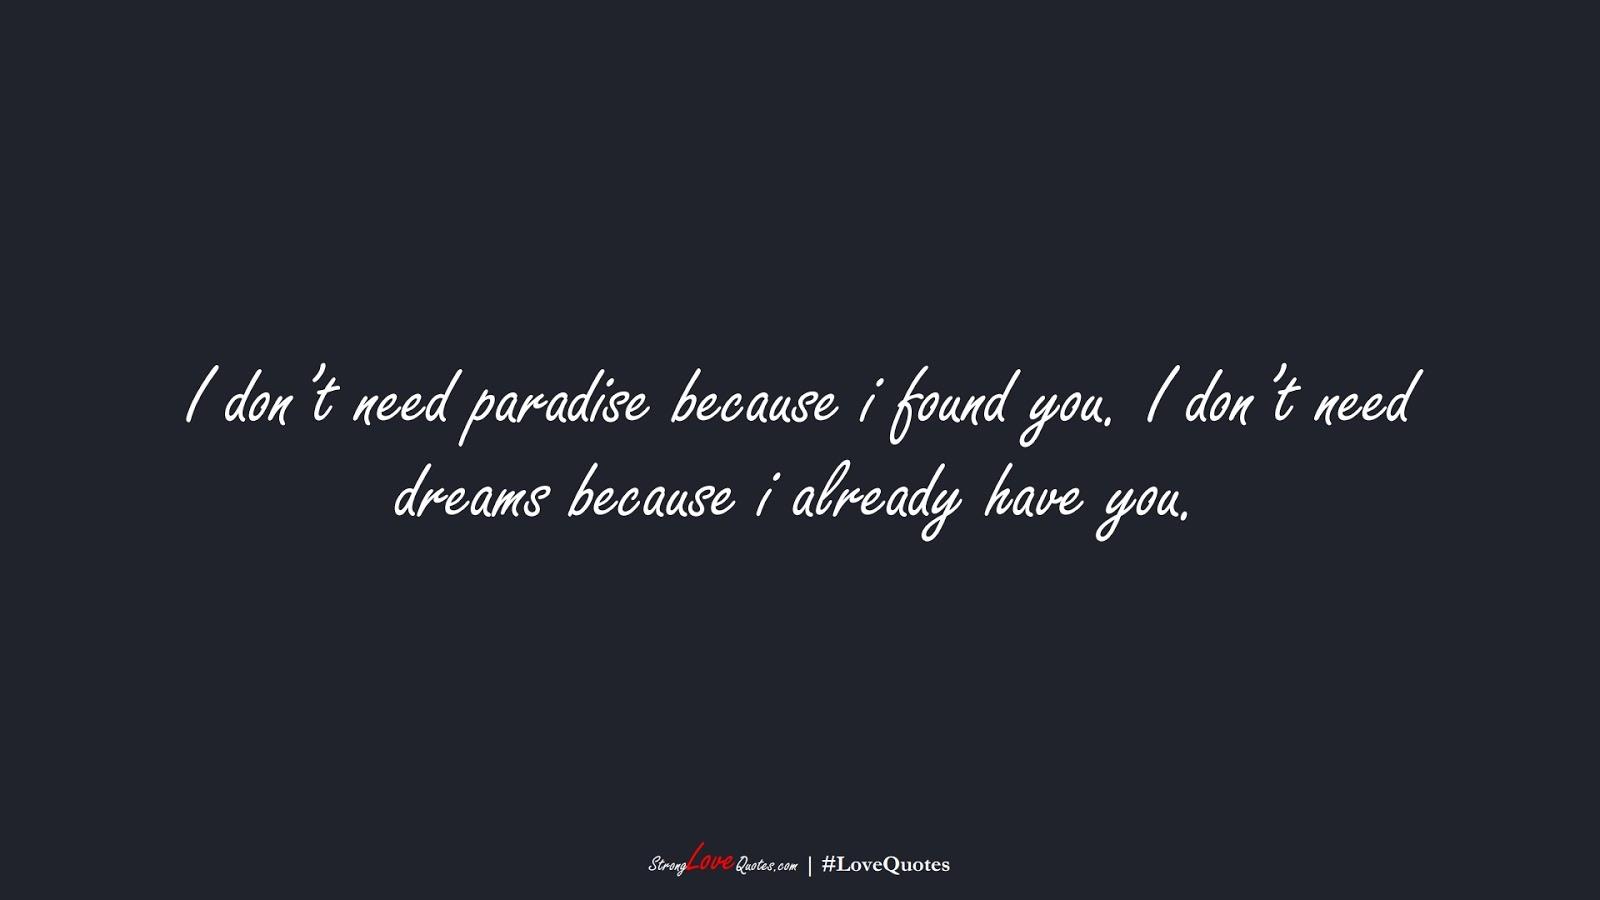 I don't need paradise because i found you. I don't need dreams because i already have you.FALSE